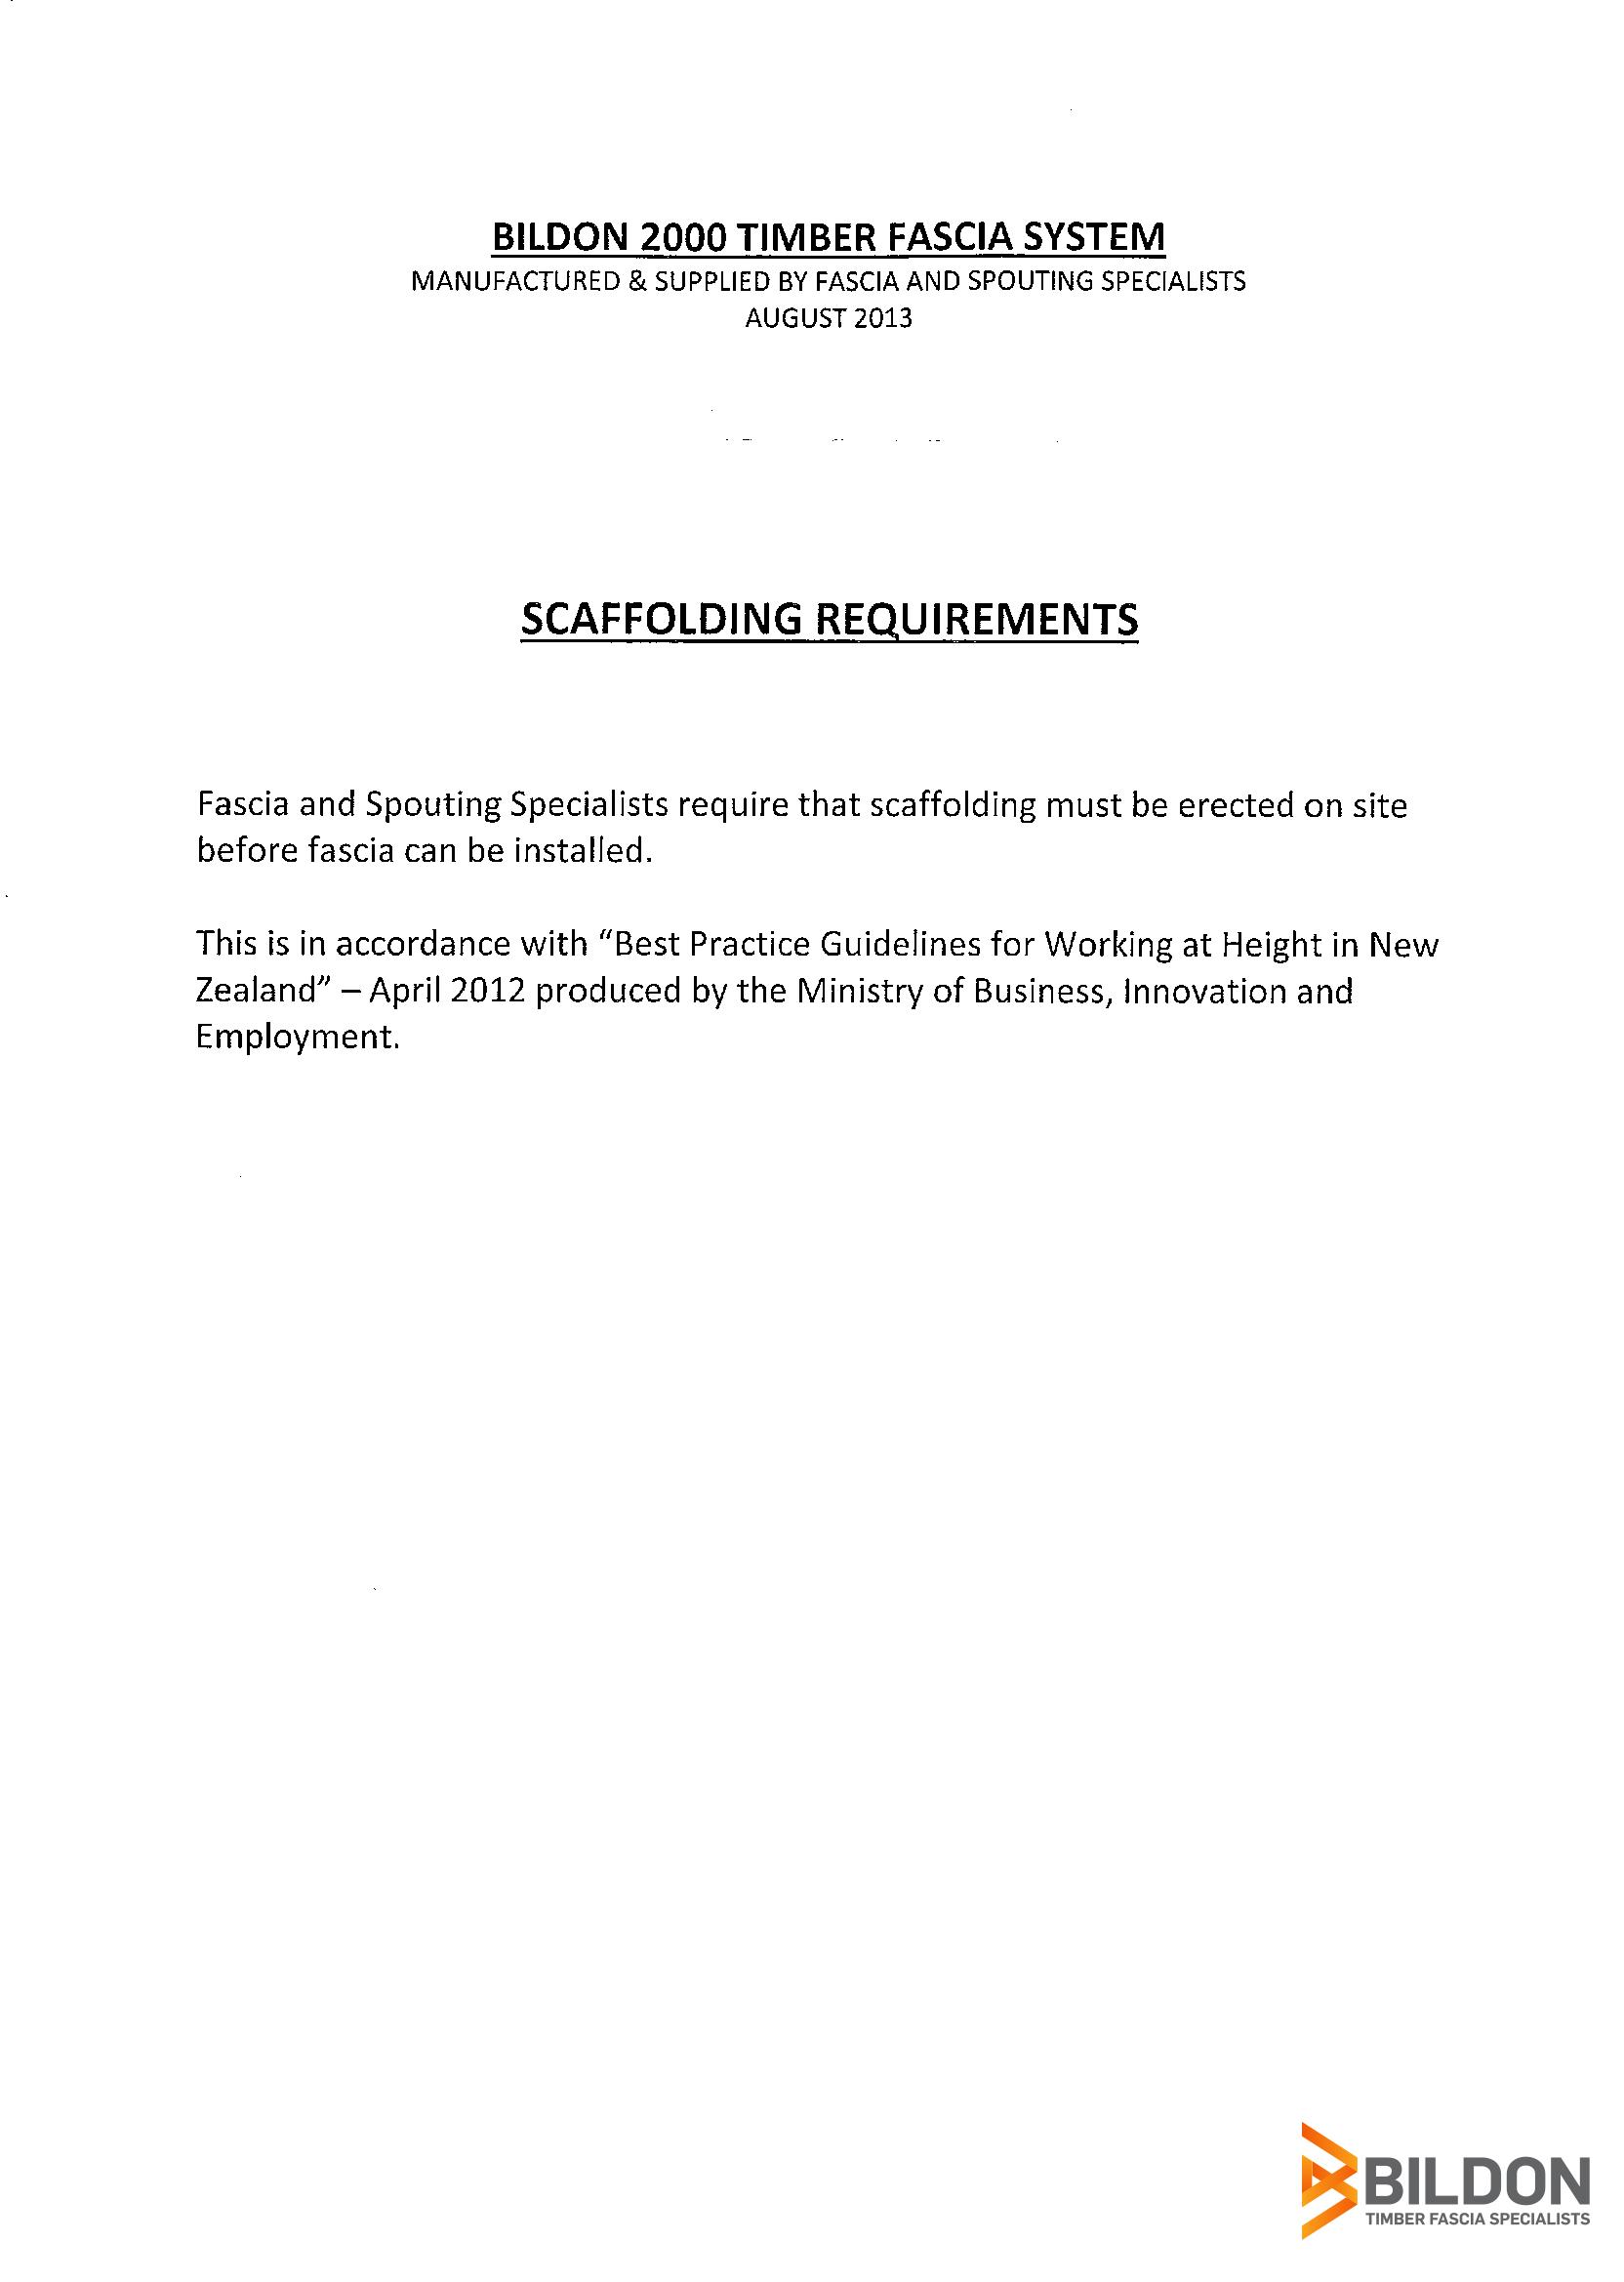 Scaffolding Requirements.jpg